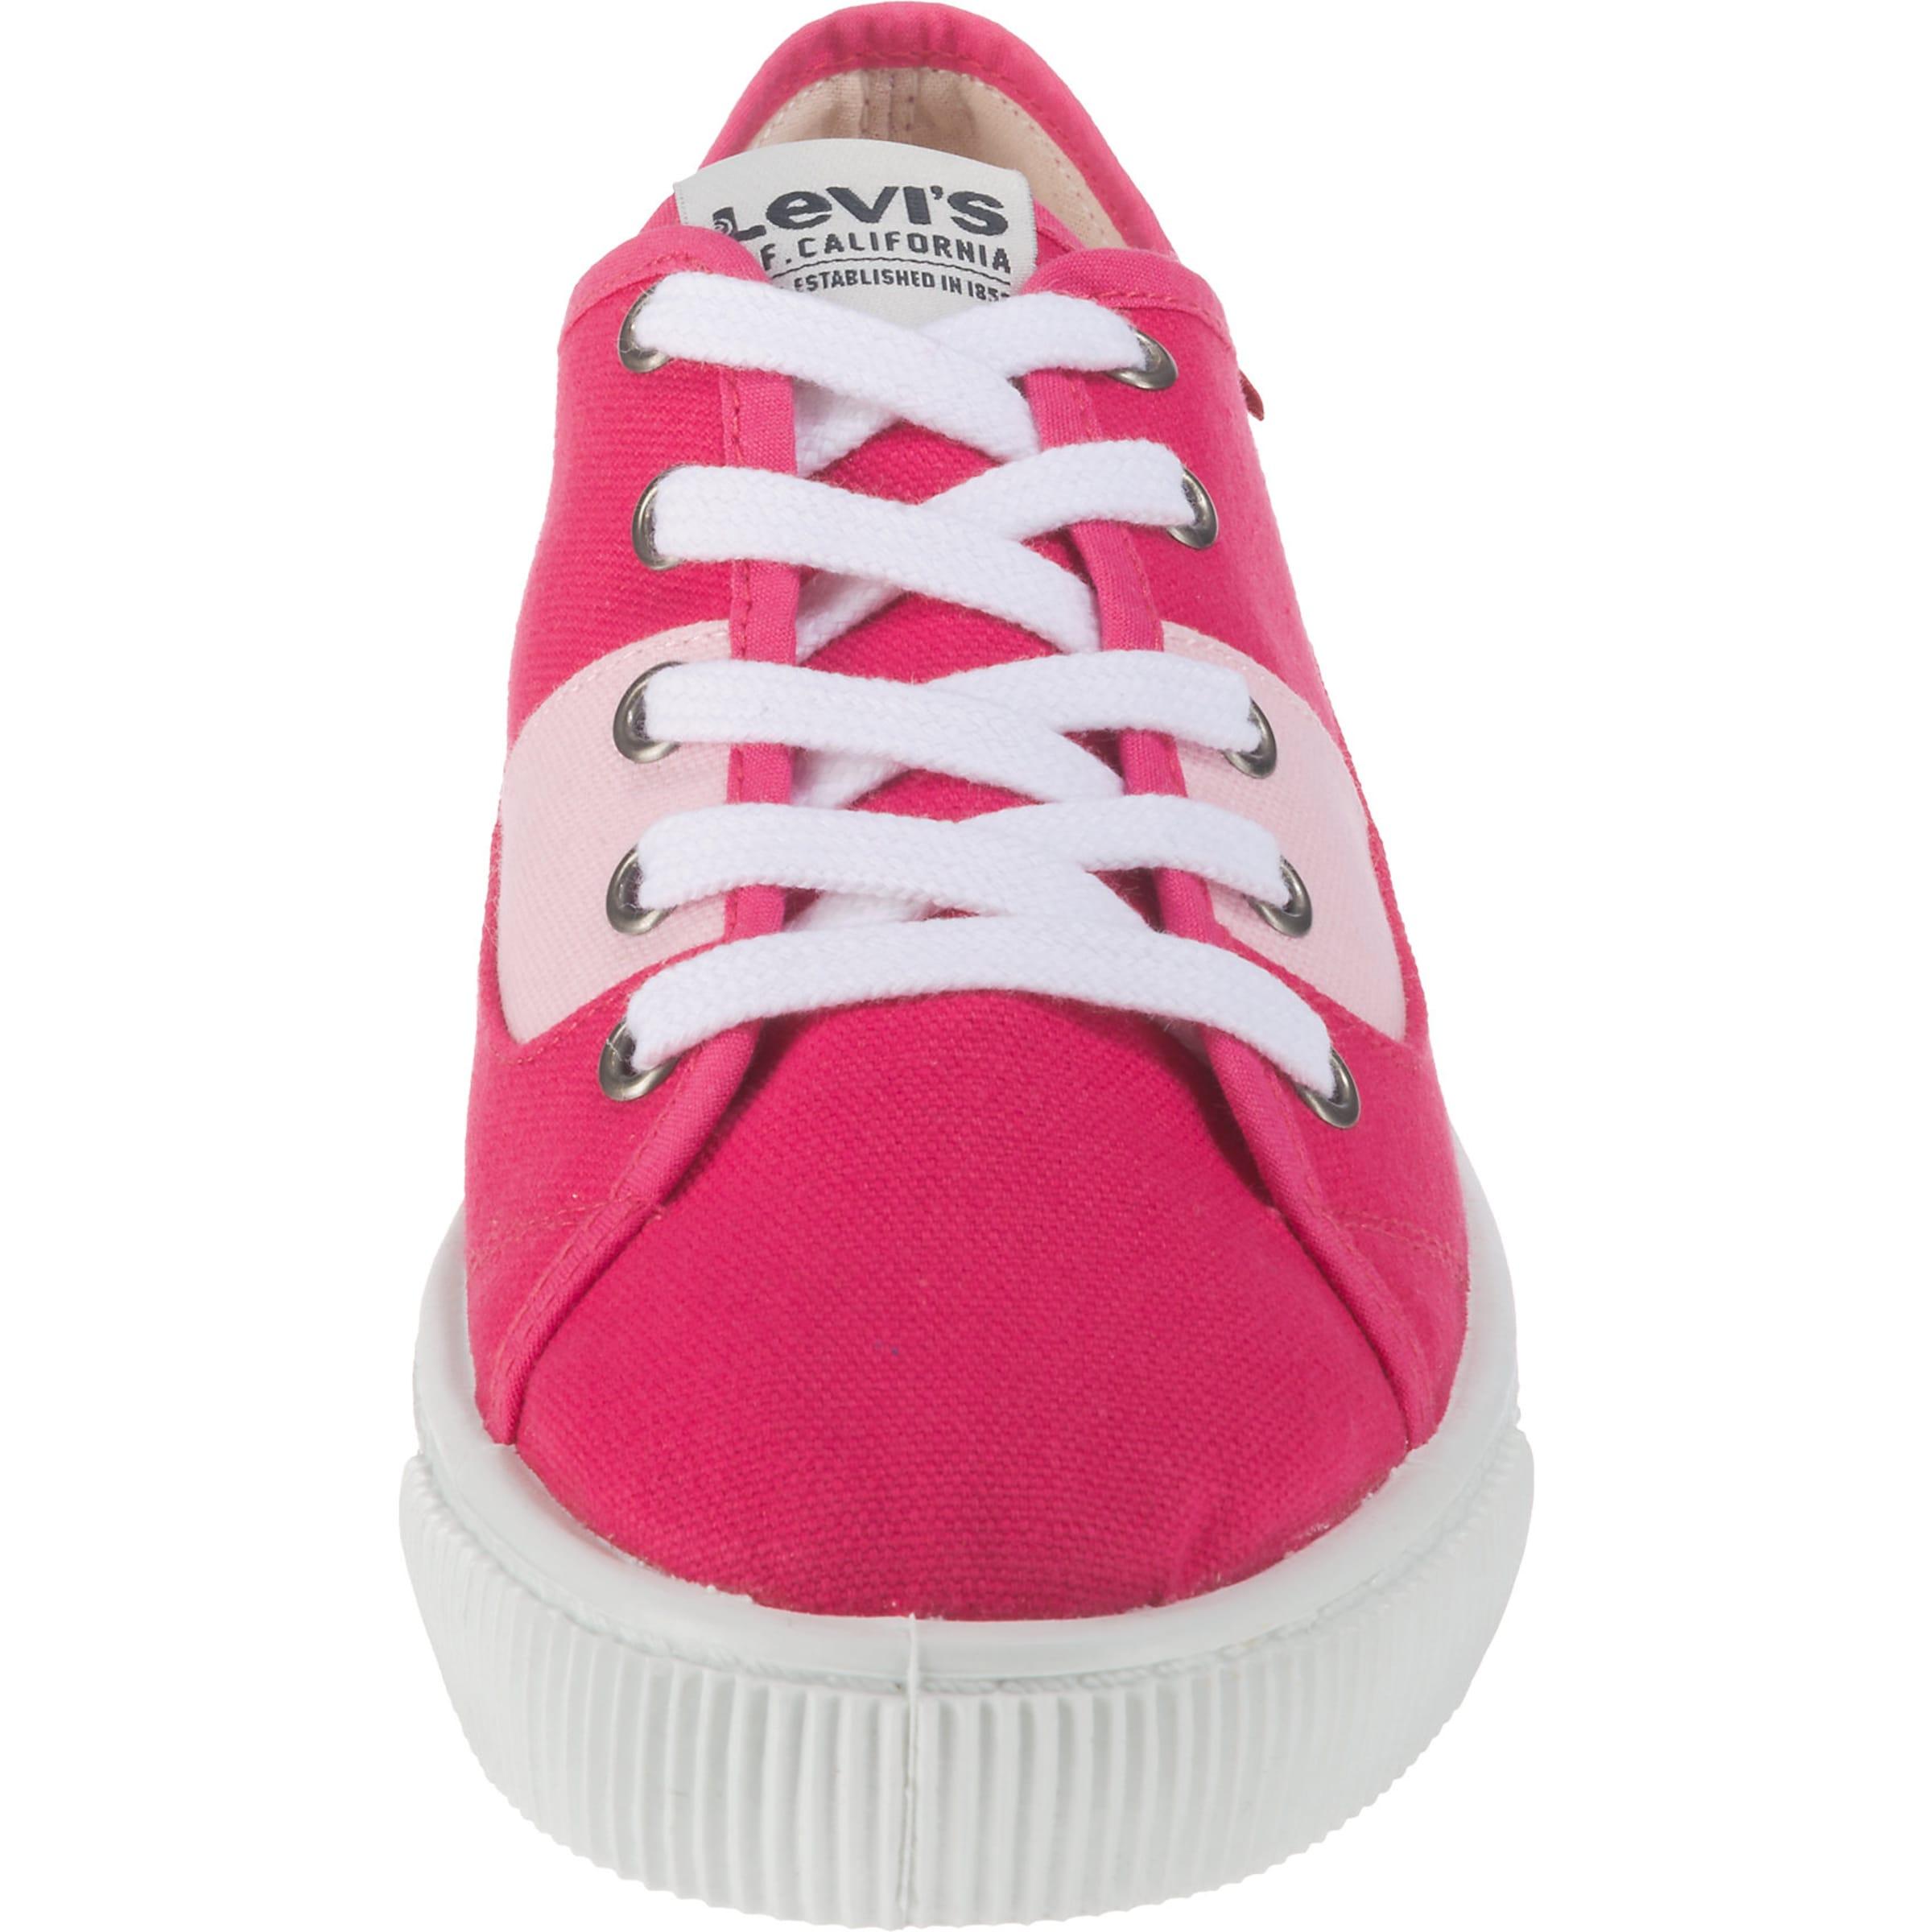 LEVI'S 'Malibu Lady Patch' Sneakers Low Footlocker Verkauf Online Rabatt-Spielraum 6dQd1PmtVg